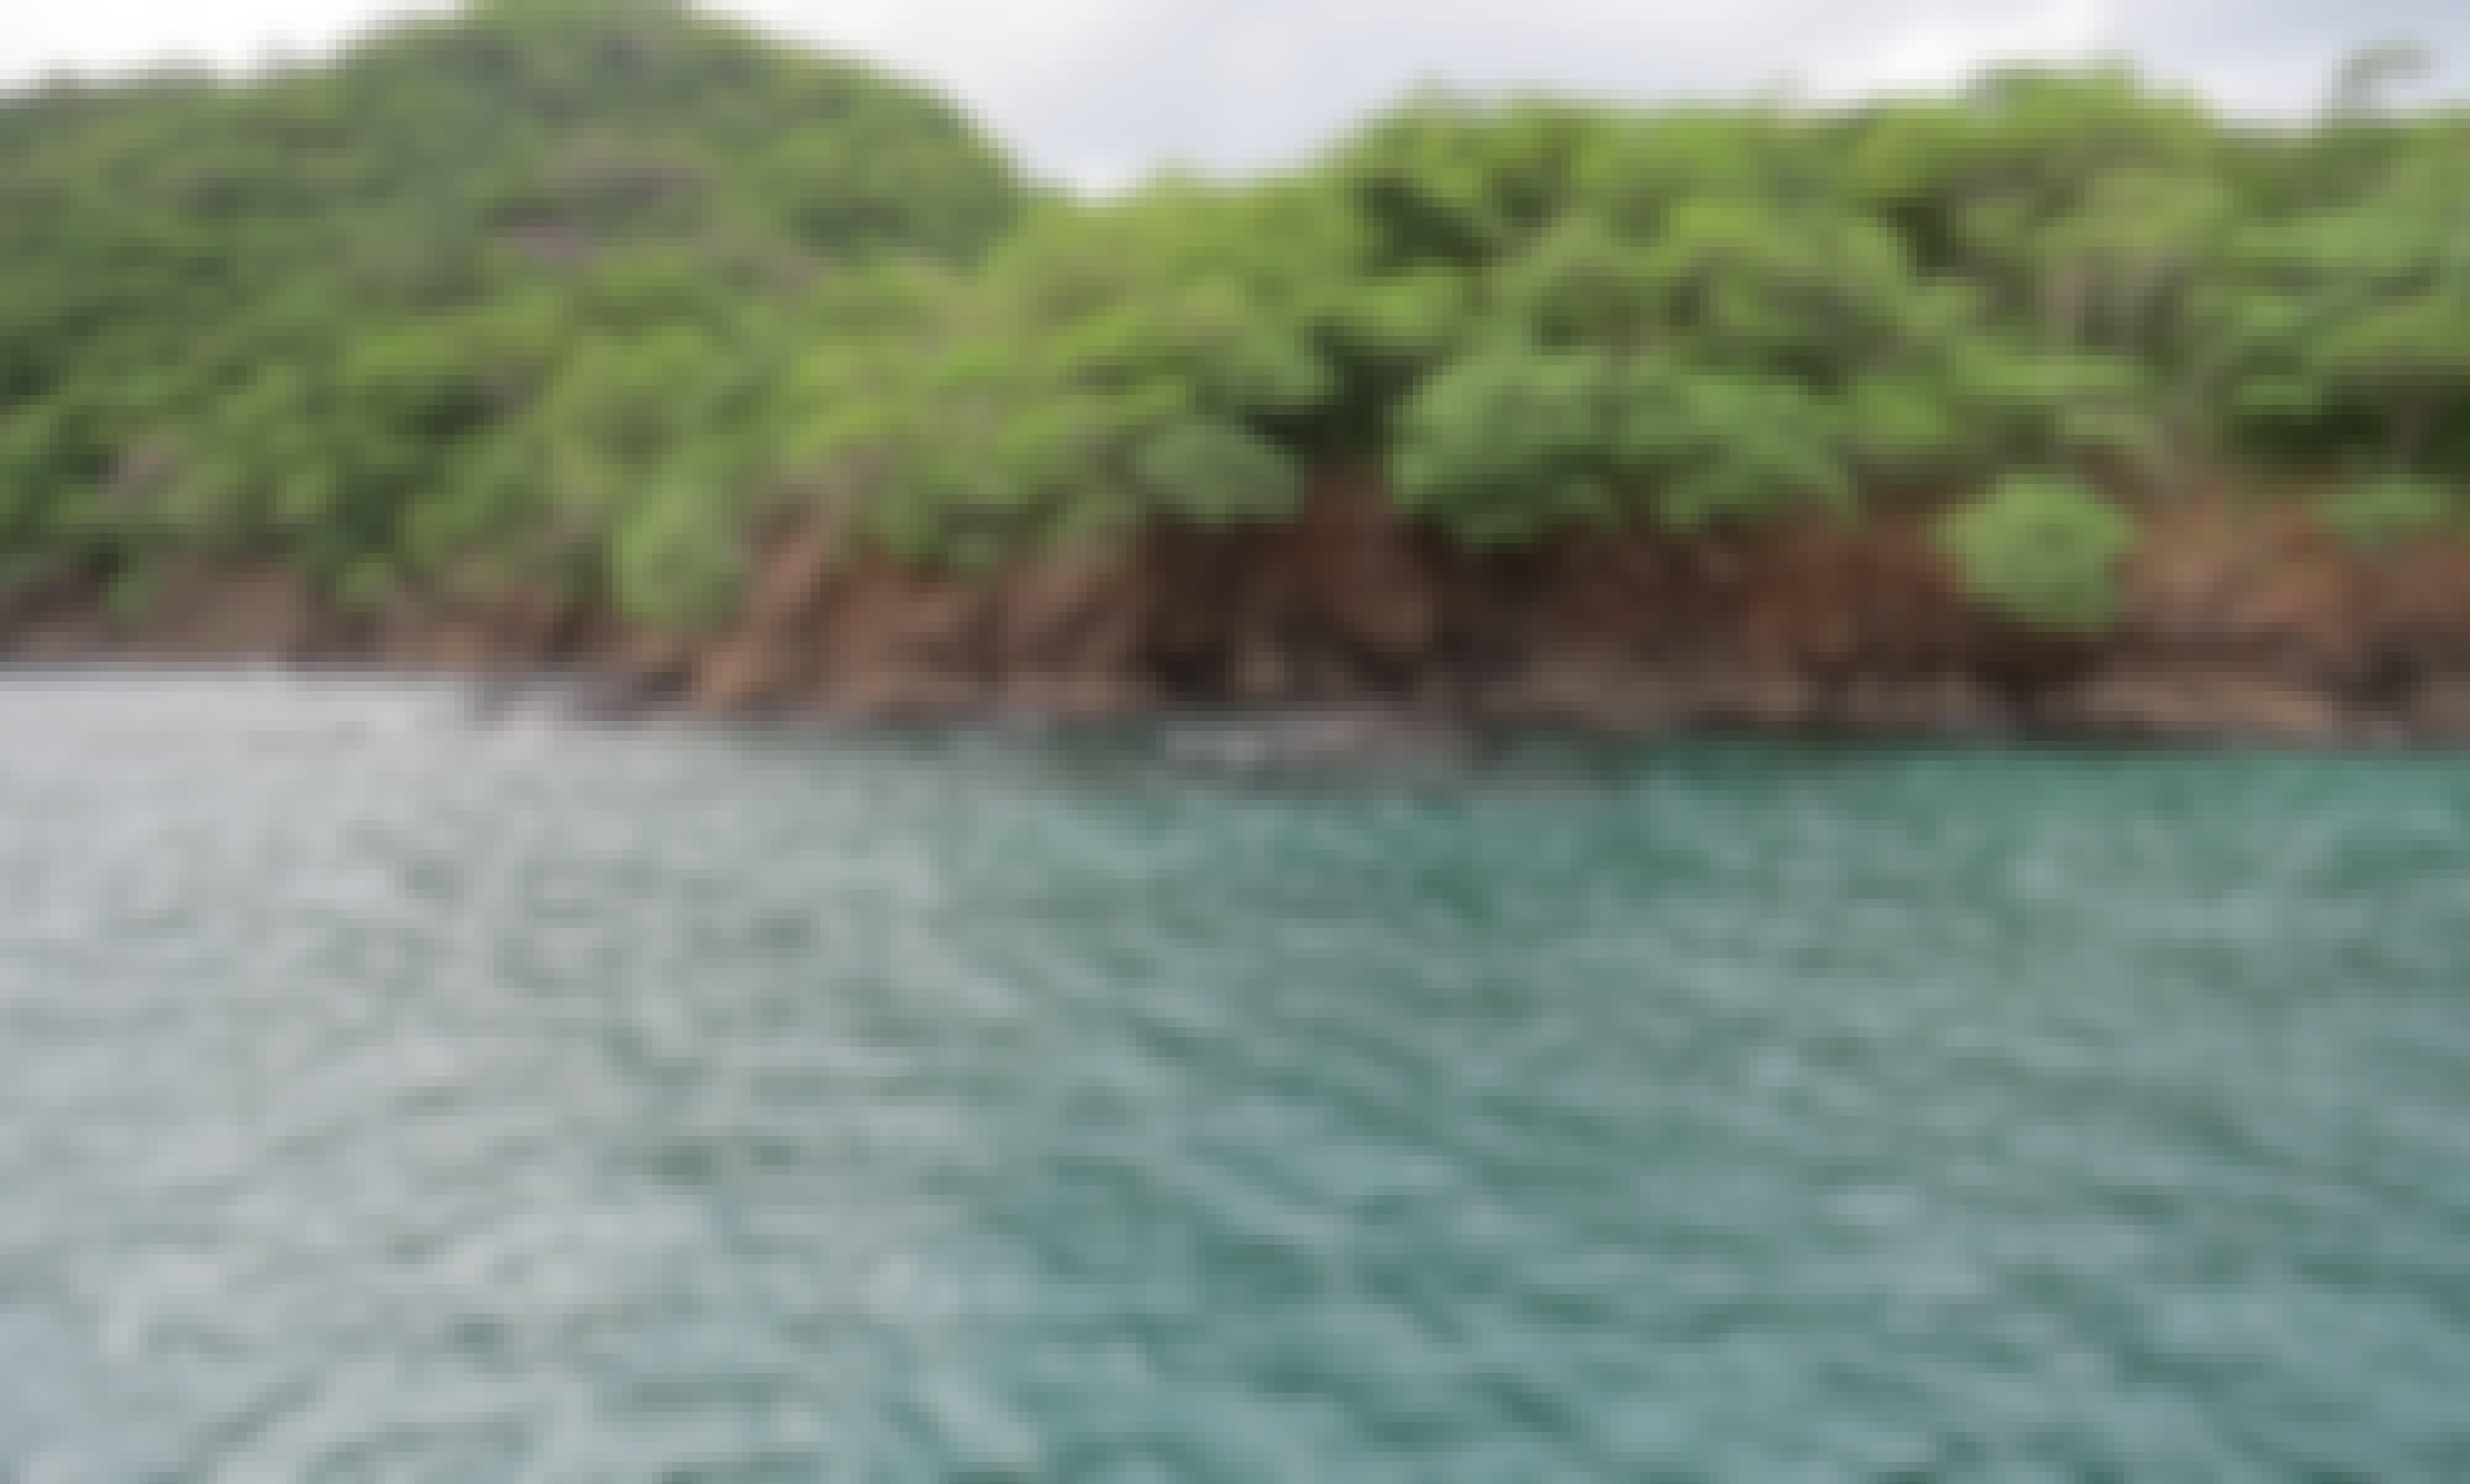 Morning Ocean Catamaran Experience in Playa Flamingo, Costa Rica